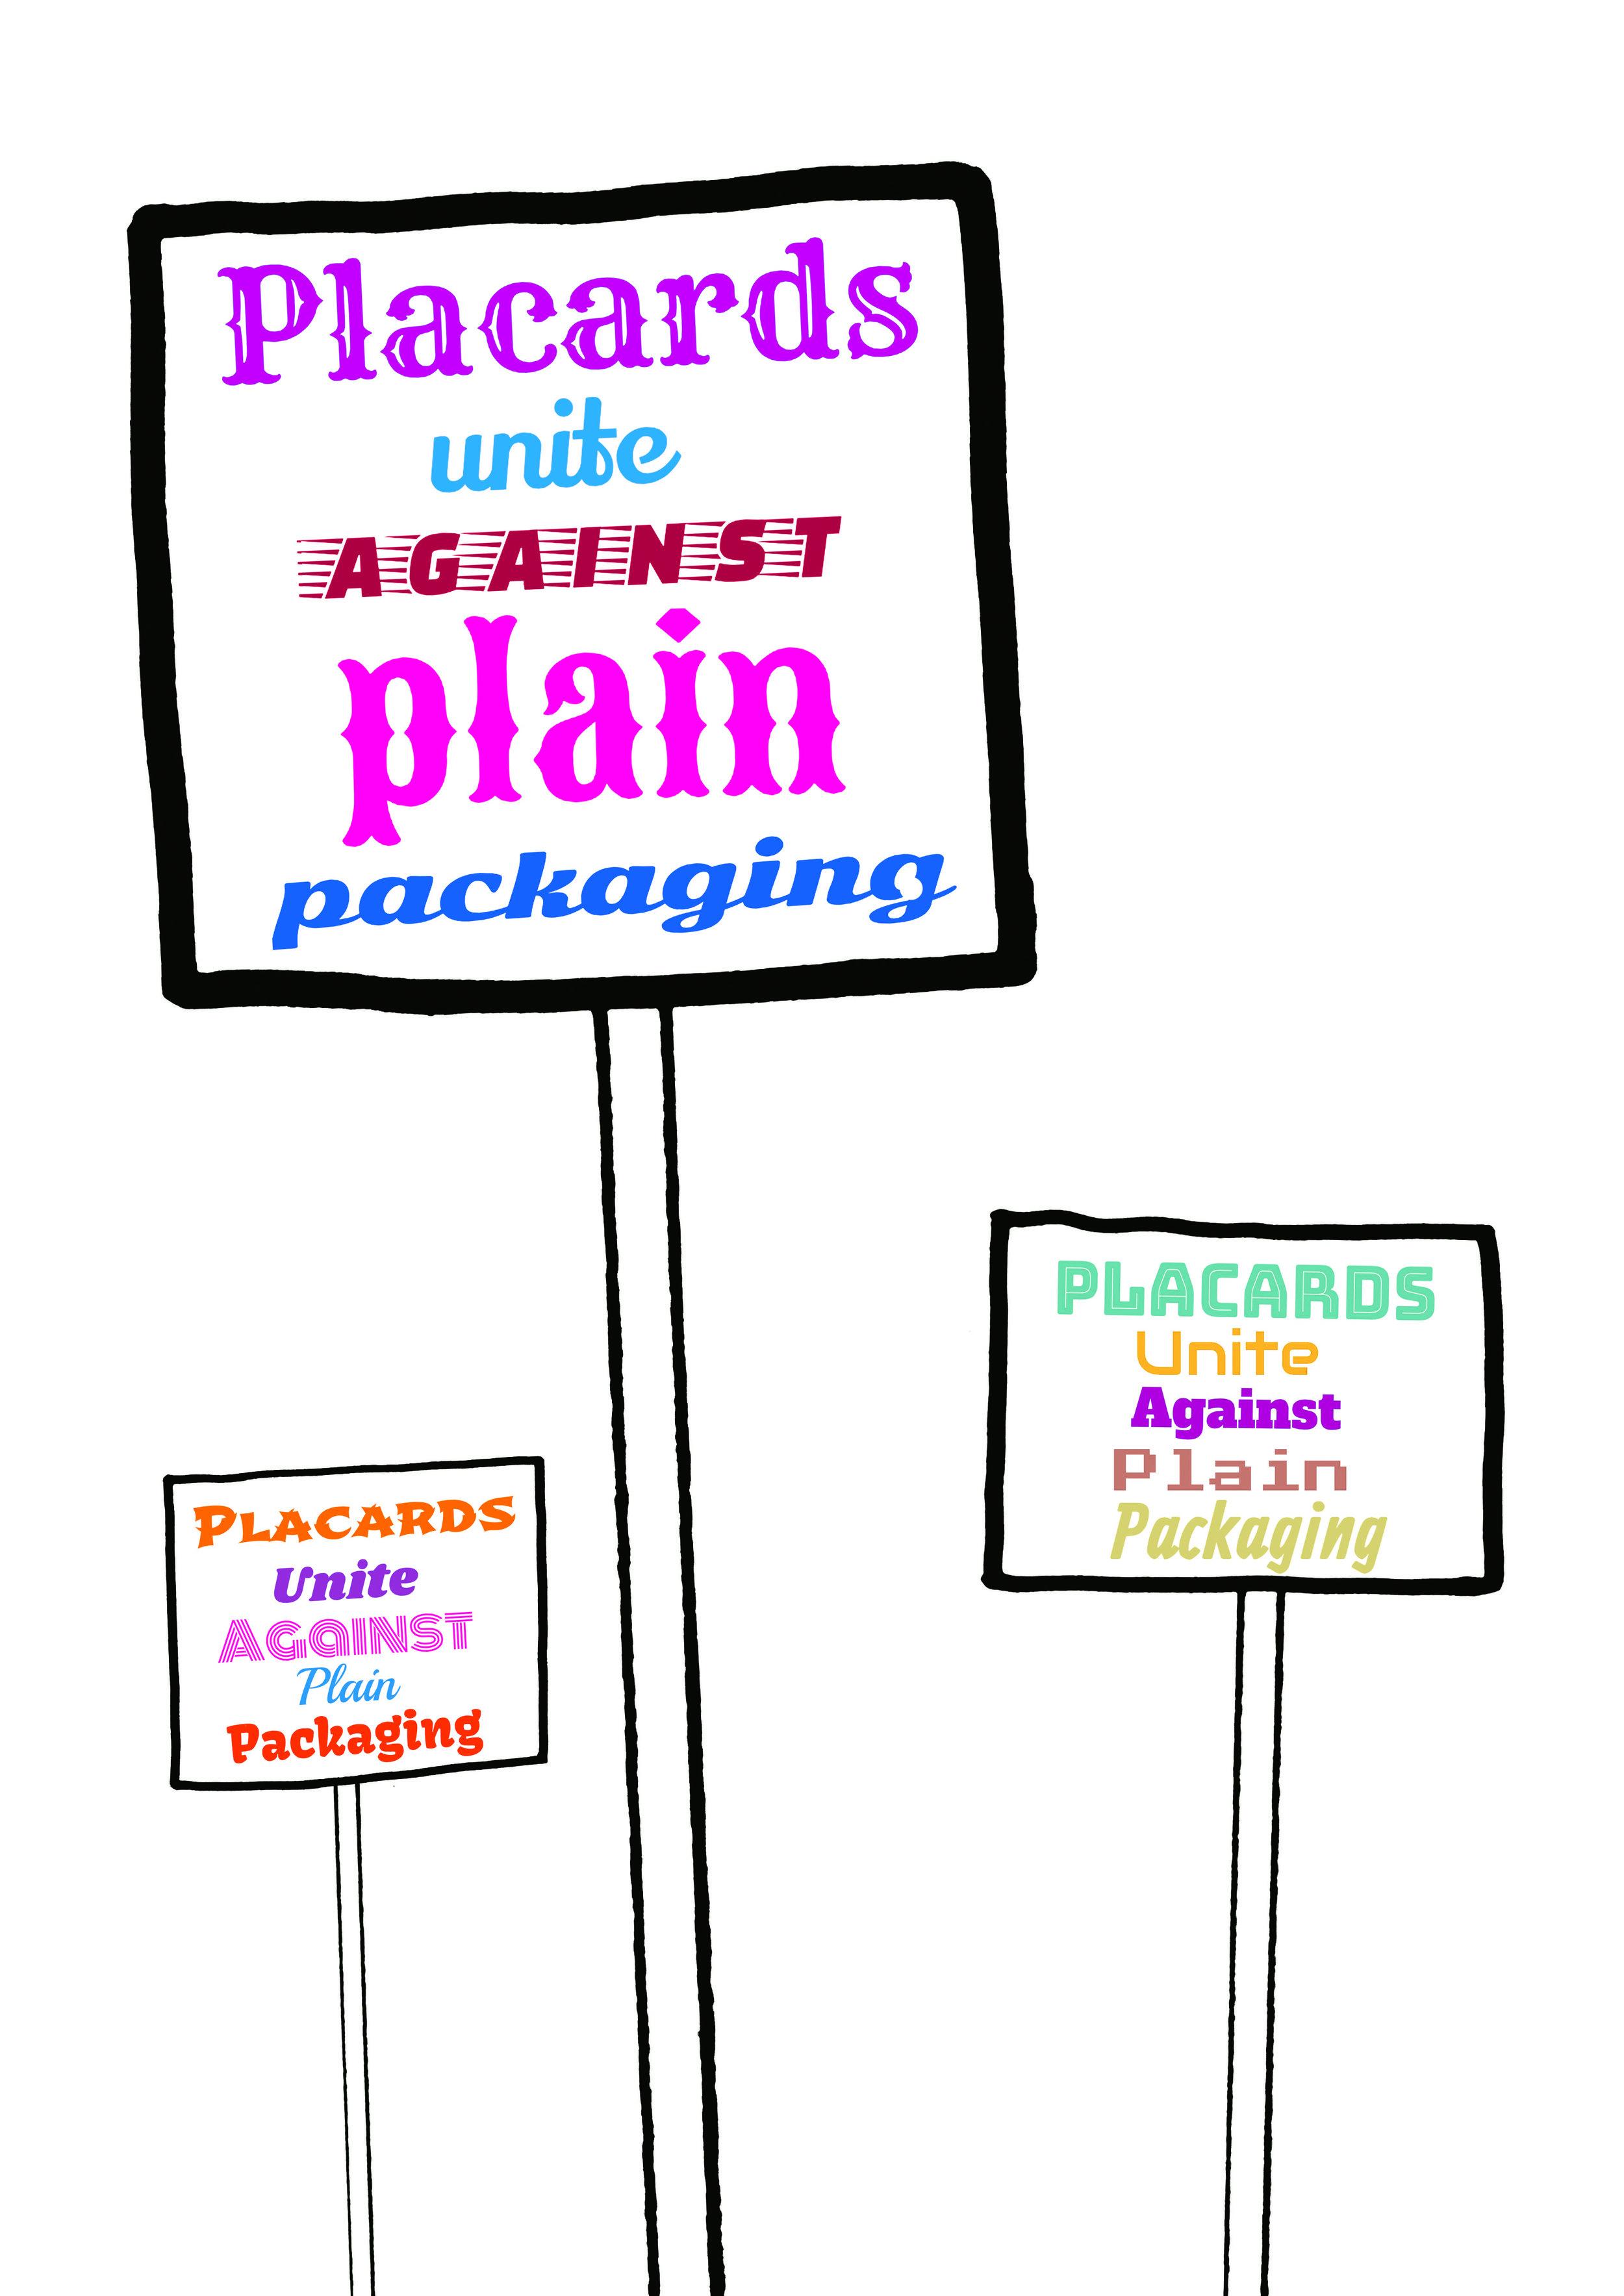 against-plain-packaging.jpg